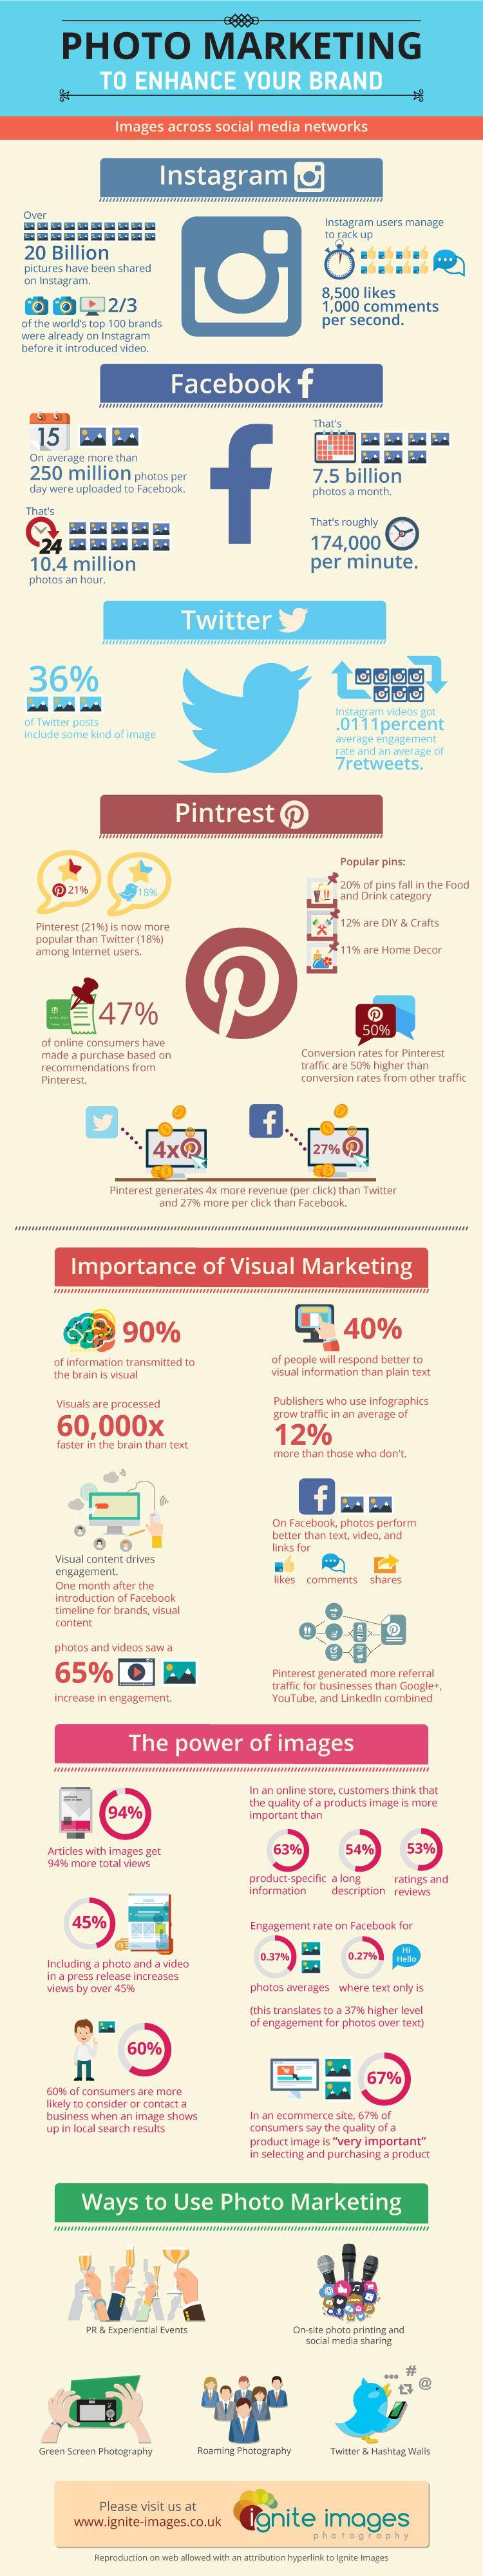 Ignite-Images-Infographic-Photo-Marketing